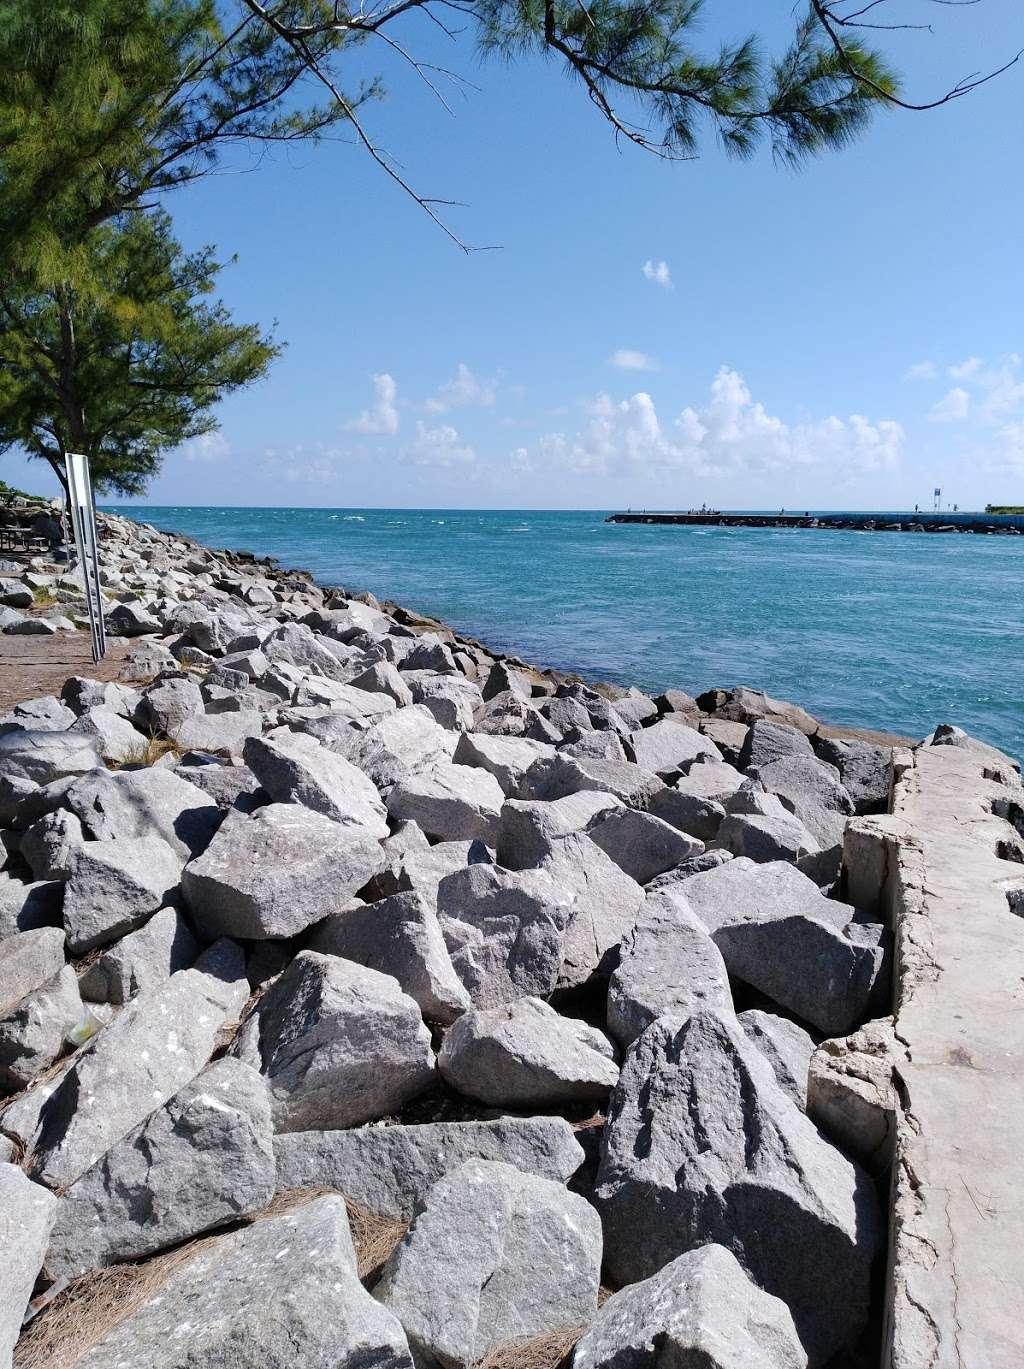 Haulover Park Bayside Picnic Area - park  | Photo 9 of 10 | Address: 13401 Collins Ave, Miami Beach, FL 33154, USA